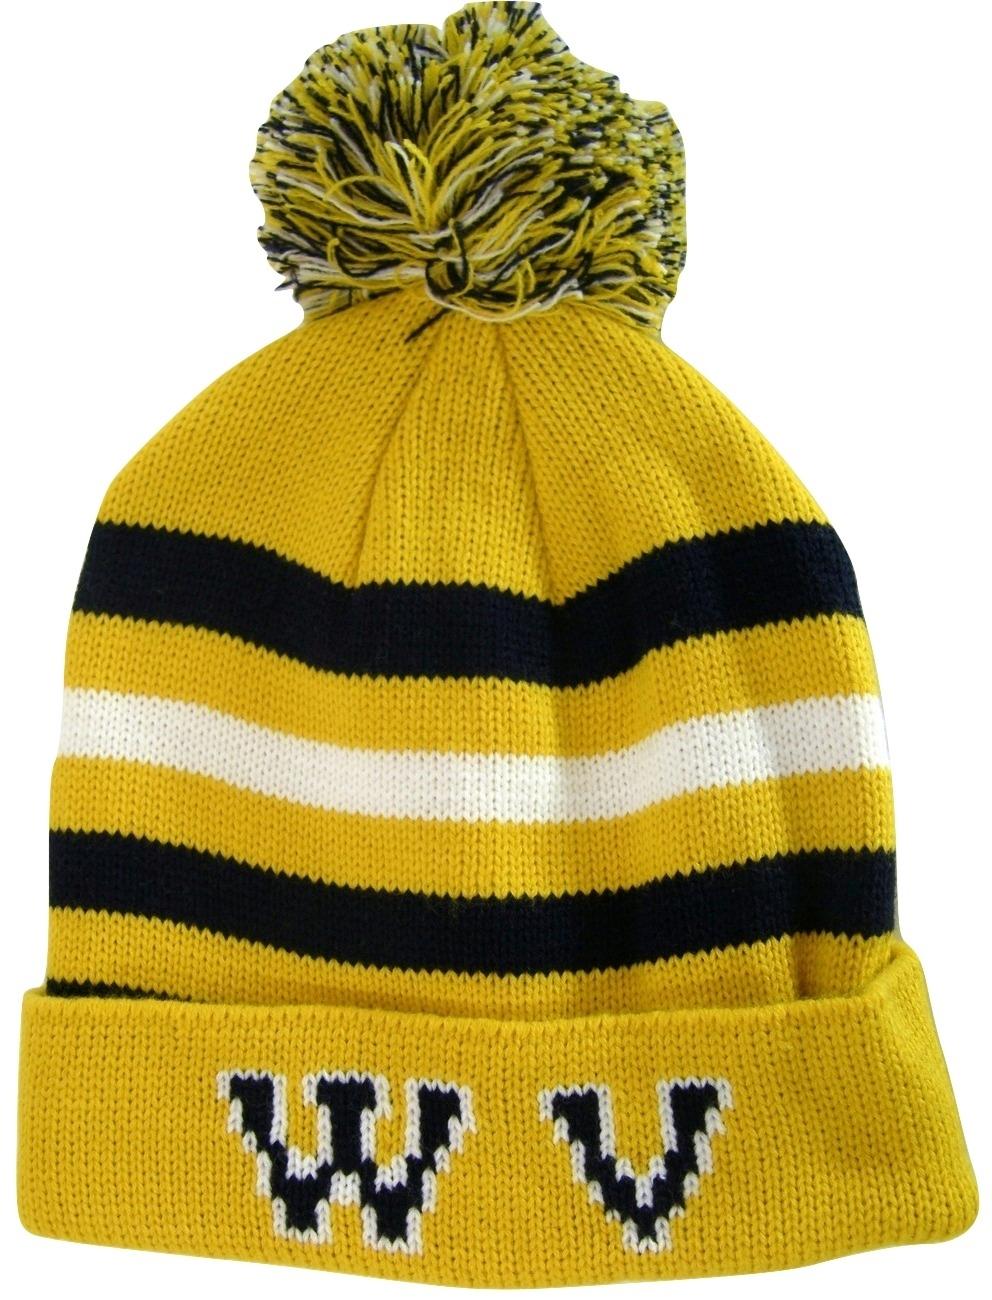 dceb61422ba Digital fade 1 007 burned 1. Digital fade 1 007 burned 1. West Virginia WV Men s  Winter Knit Cuffed Pom Beanie Toboggan Hat ...